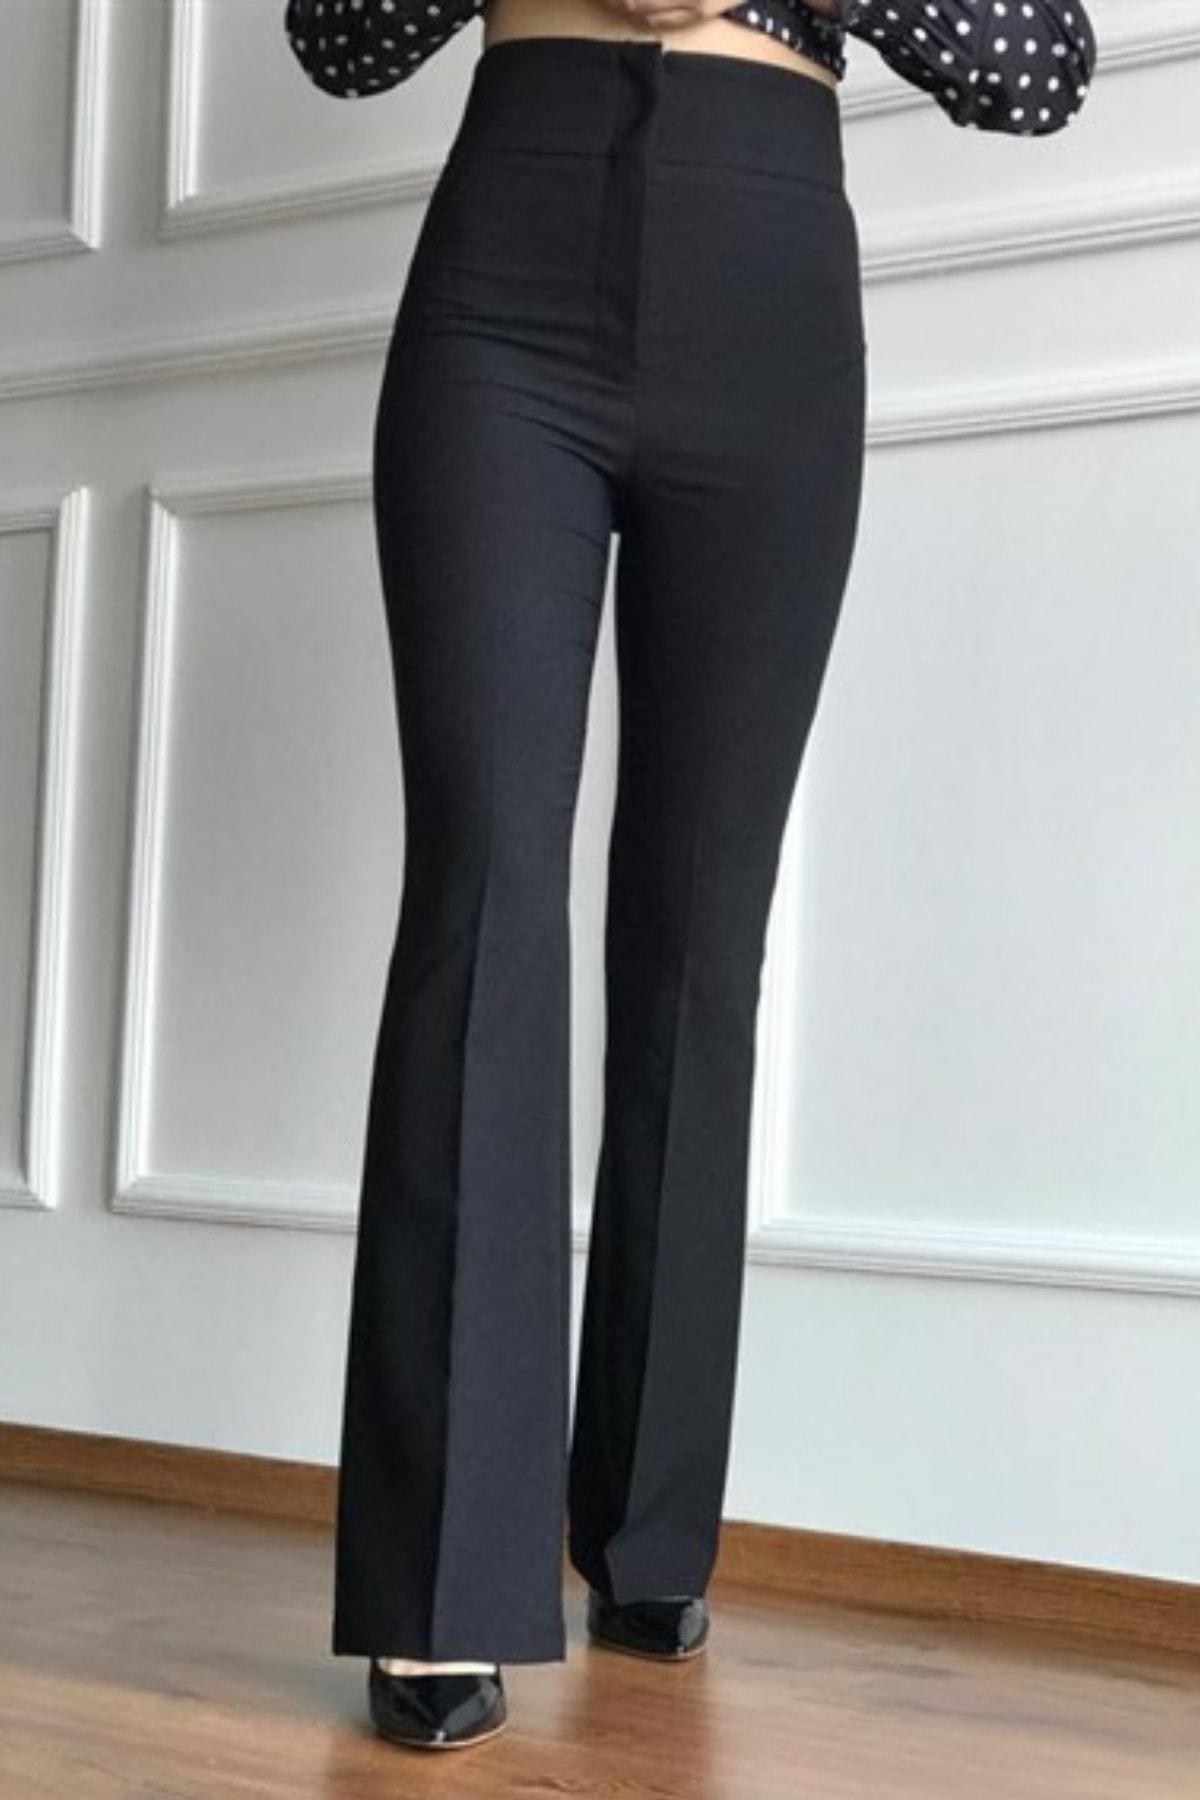 Kadın Siyah Geniş Kemer Ispanyol Paça Pantolon